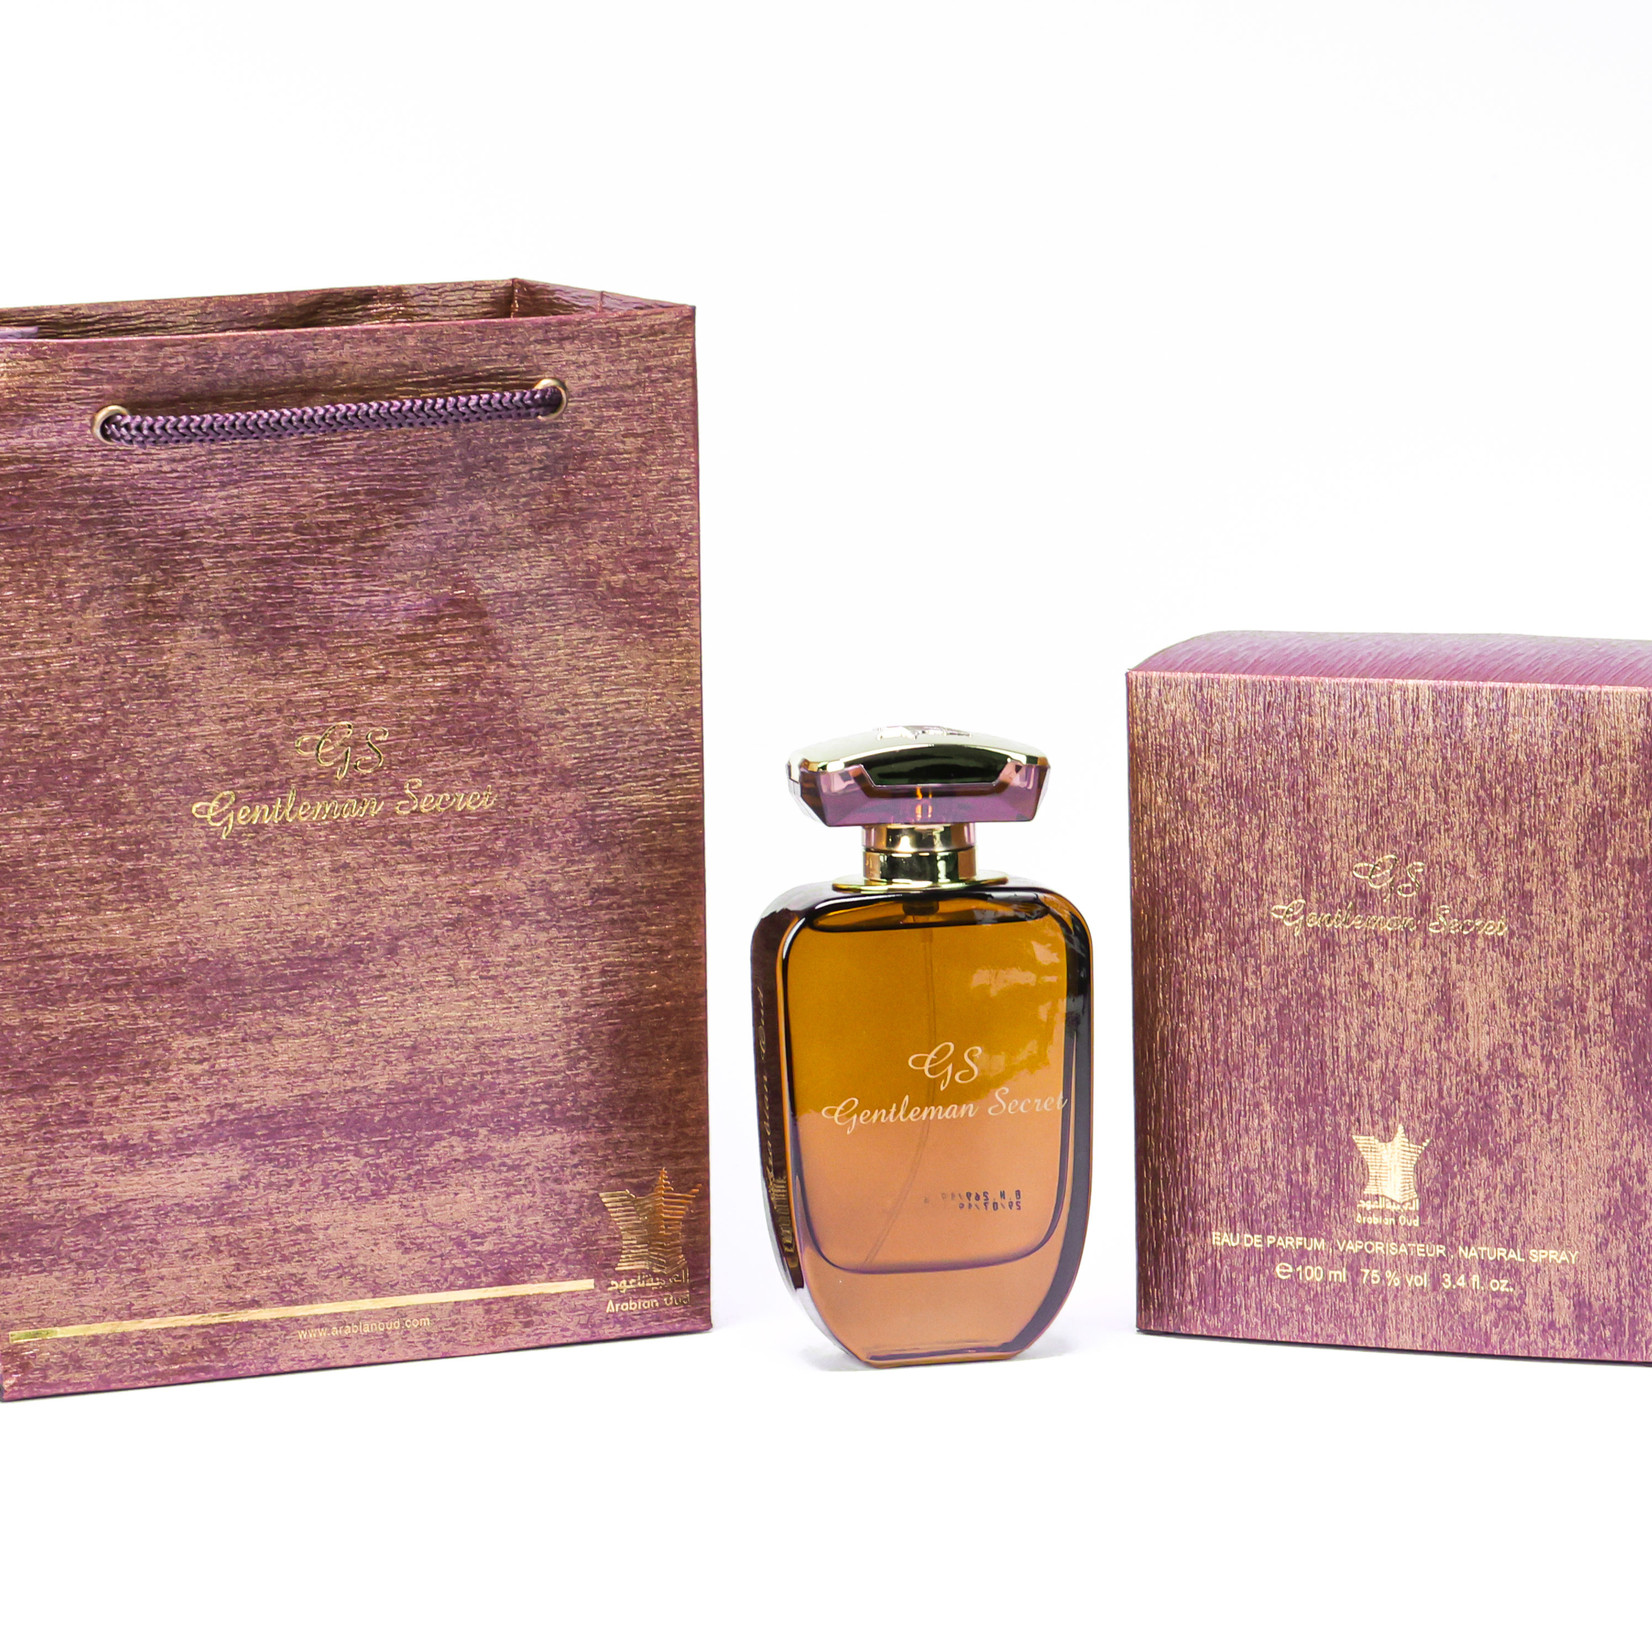 Arabian Oud Gentleman Secret (100ml Eau de Parfum)